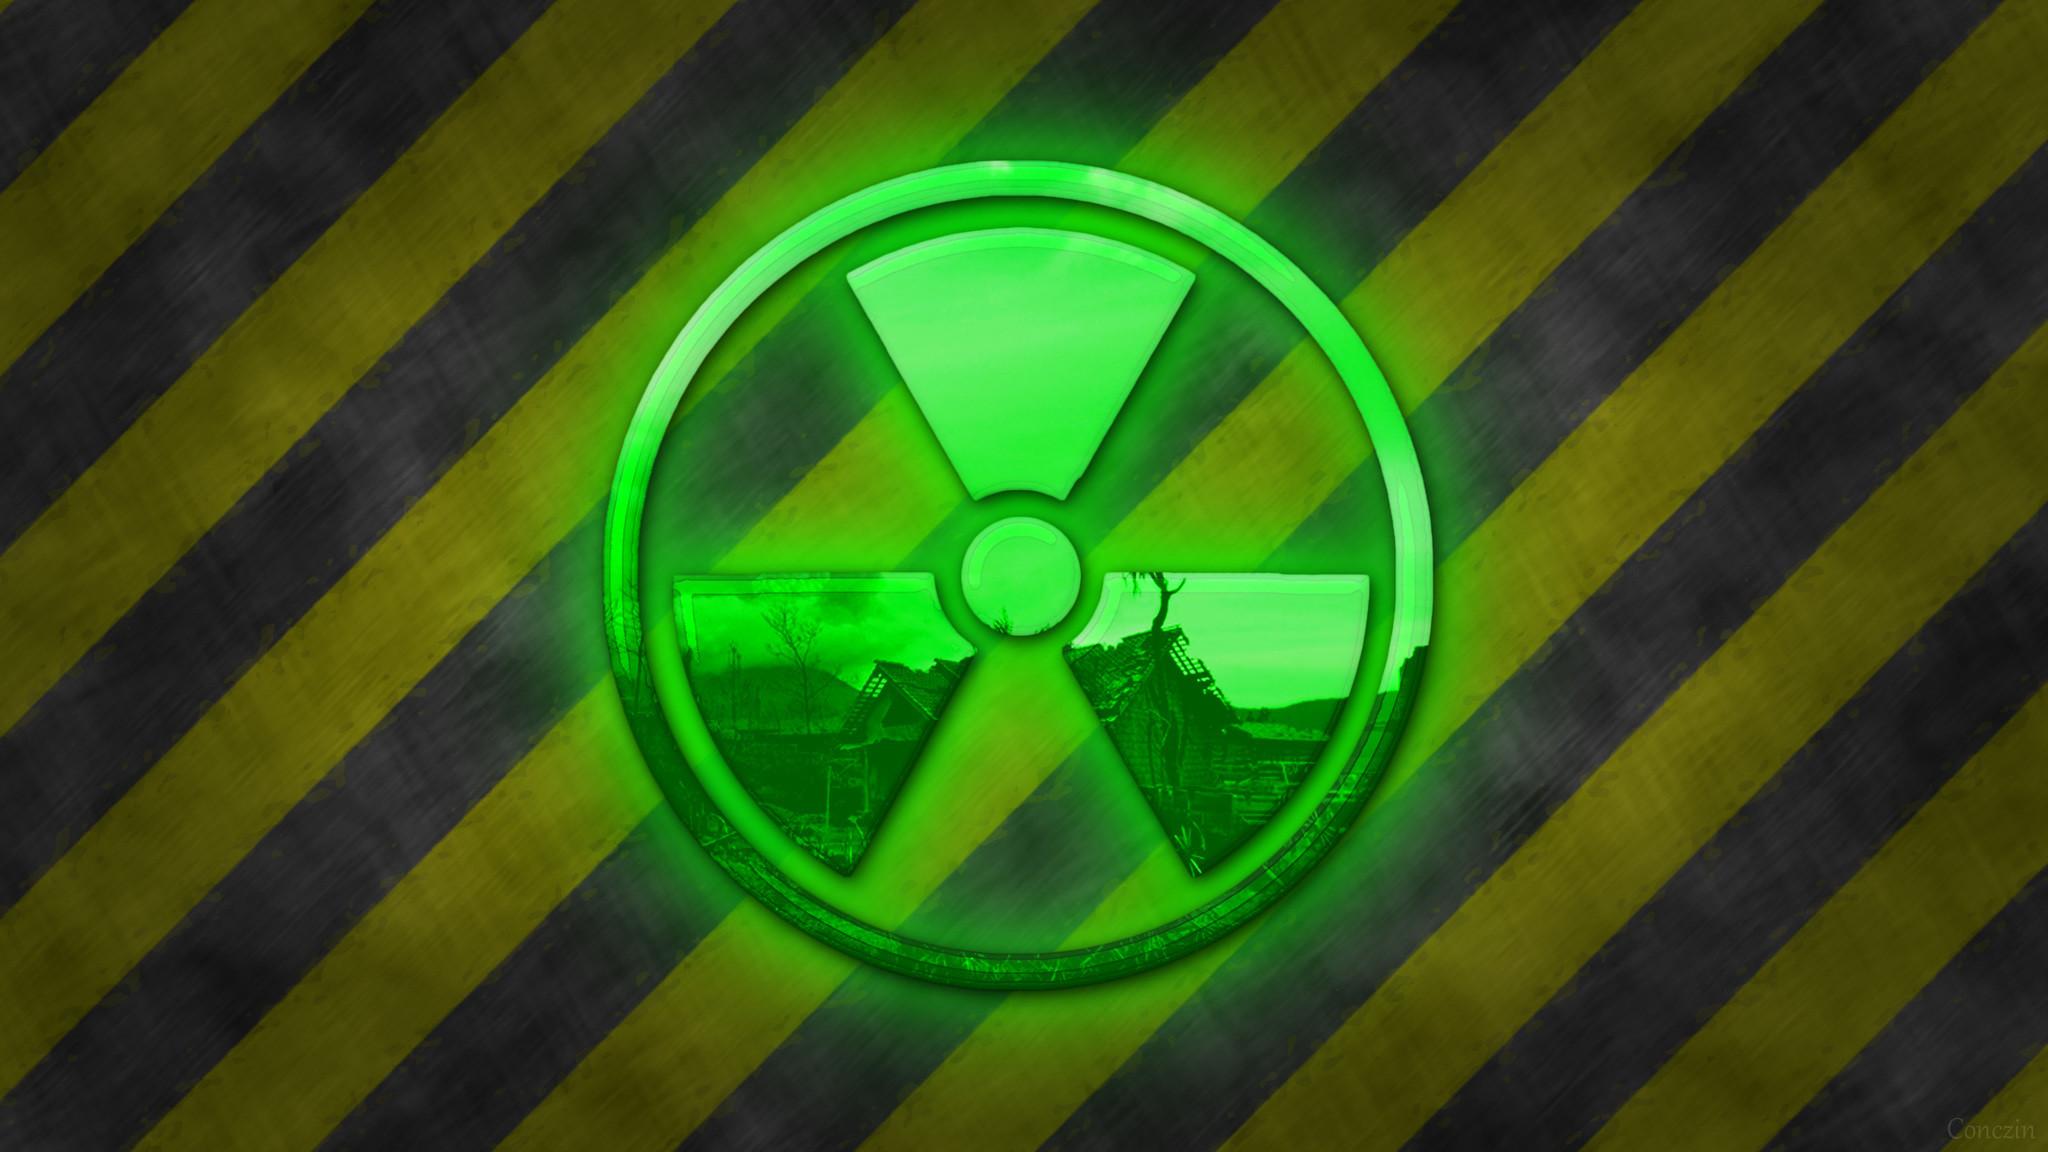 Res: 2048x1152, radioactive-8d.jpg